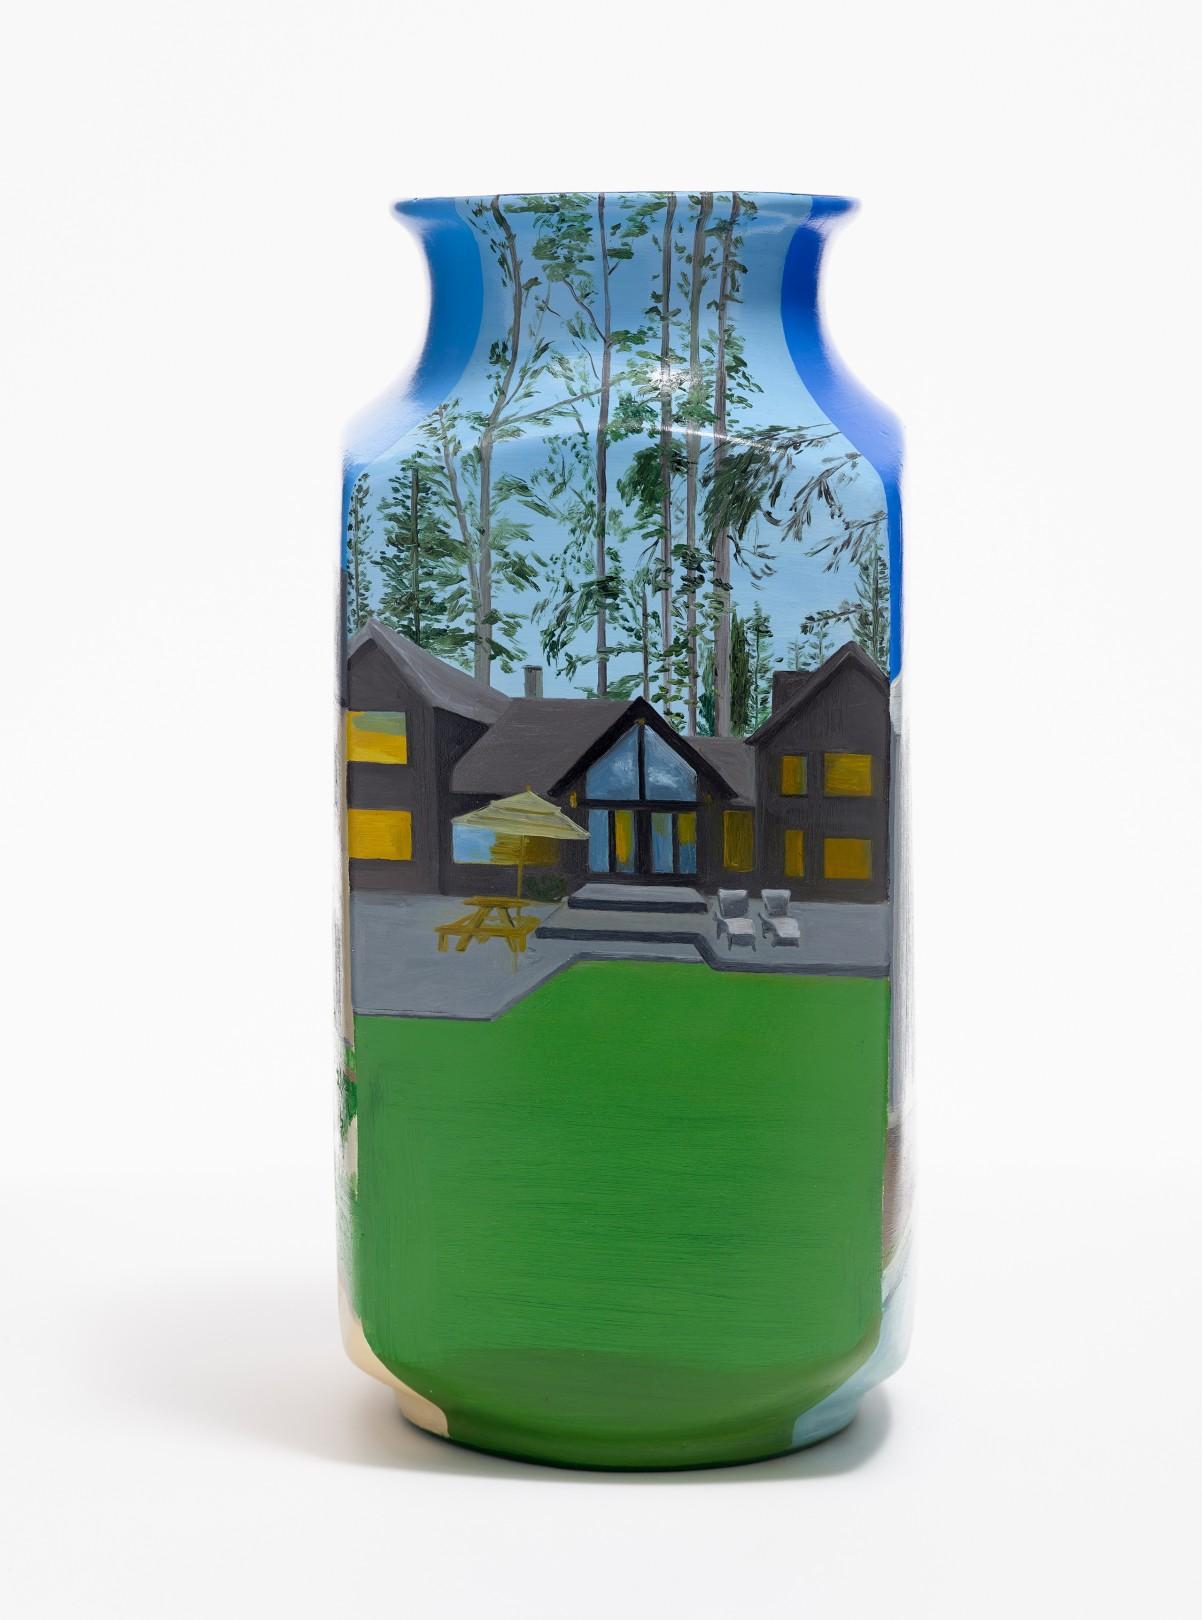 Property Portfolios , 2020 Oil on ceramic H:30 x W:13 cm. / H:11.8 x W:5.2 in.